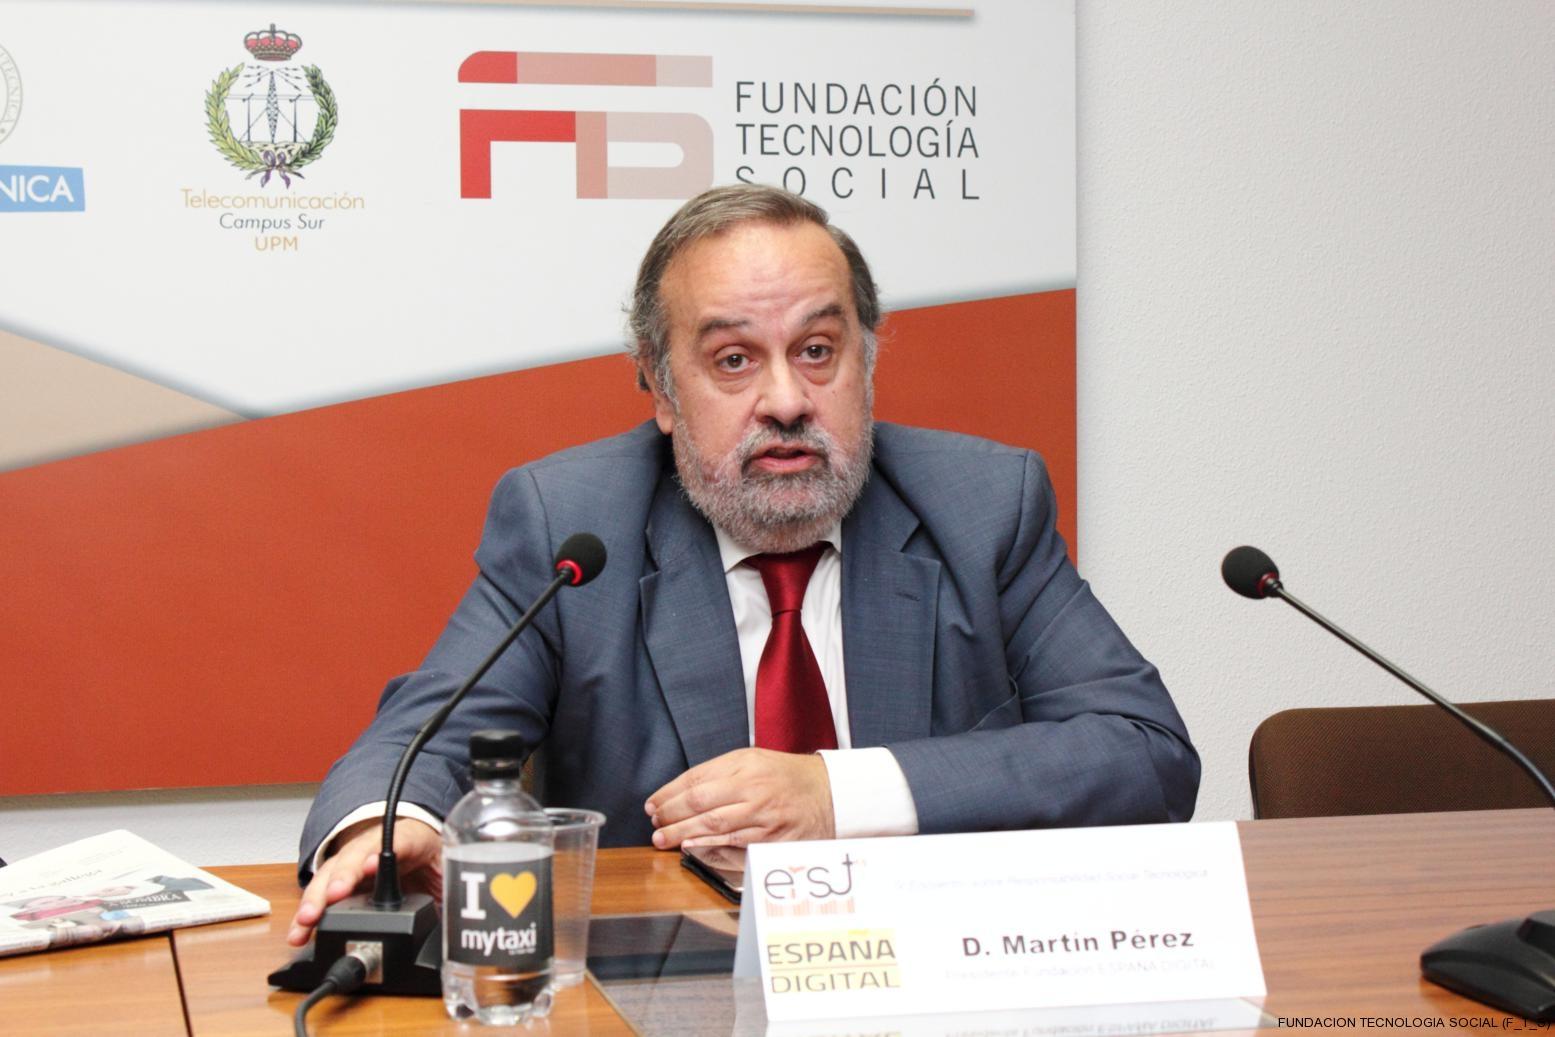 912-Martin-Perez.JPG